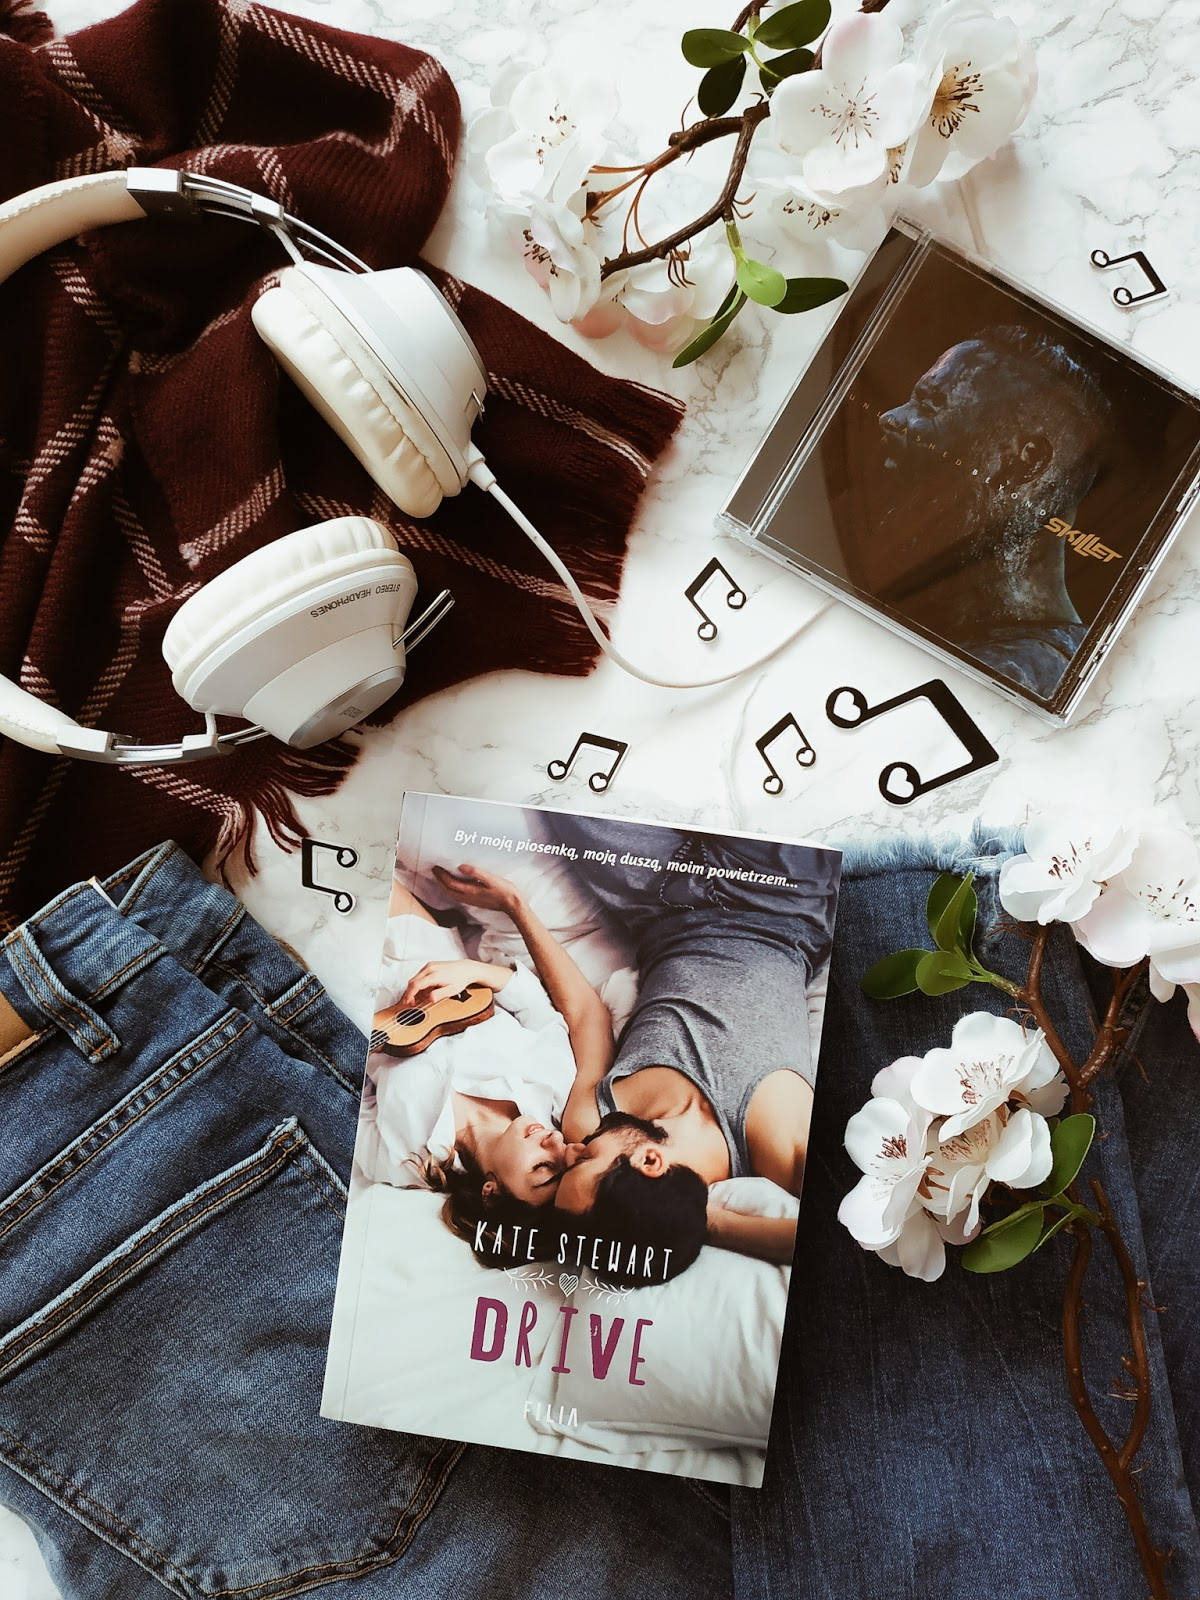 Drive – Kate Stewart [RECENZJA]